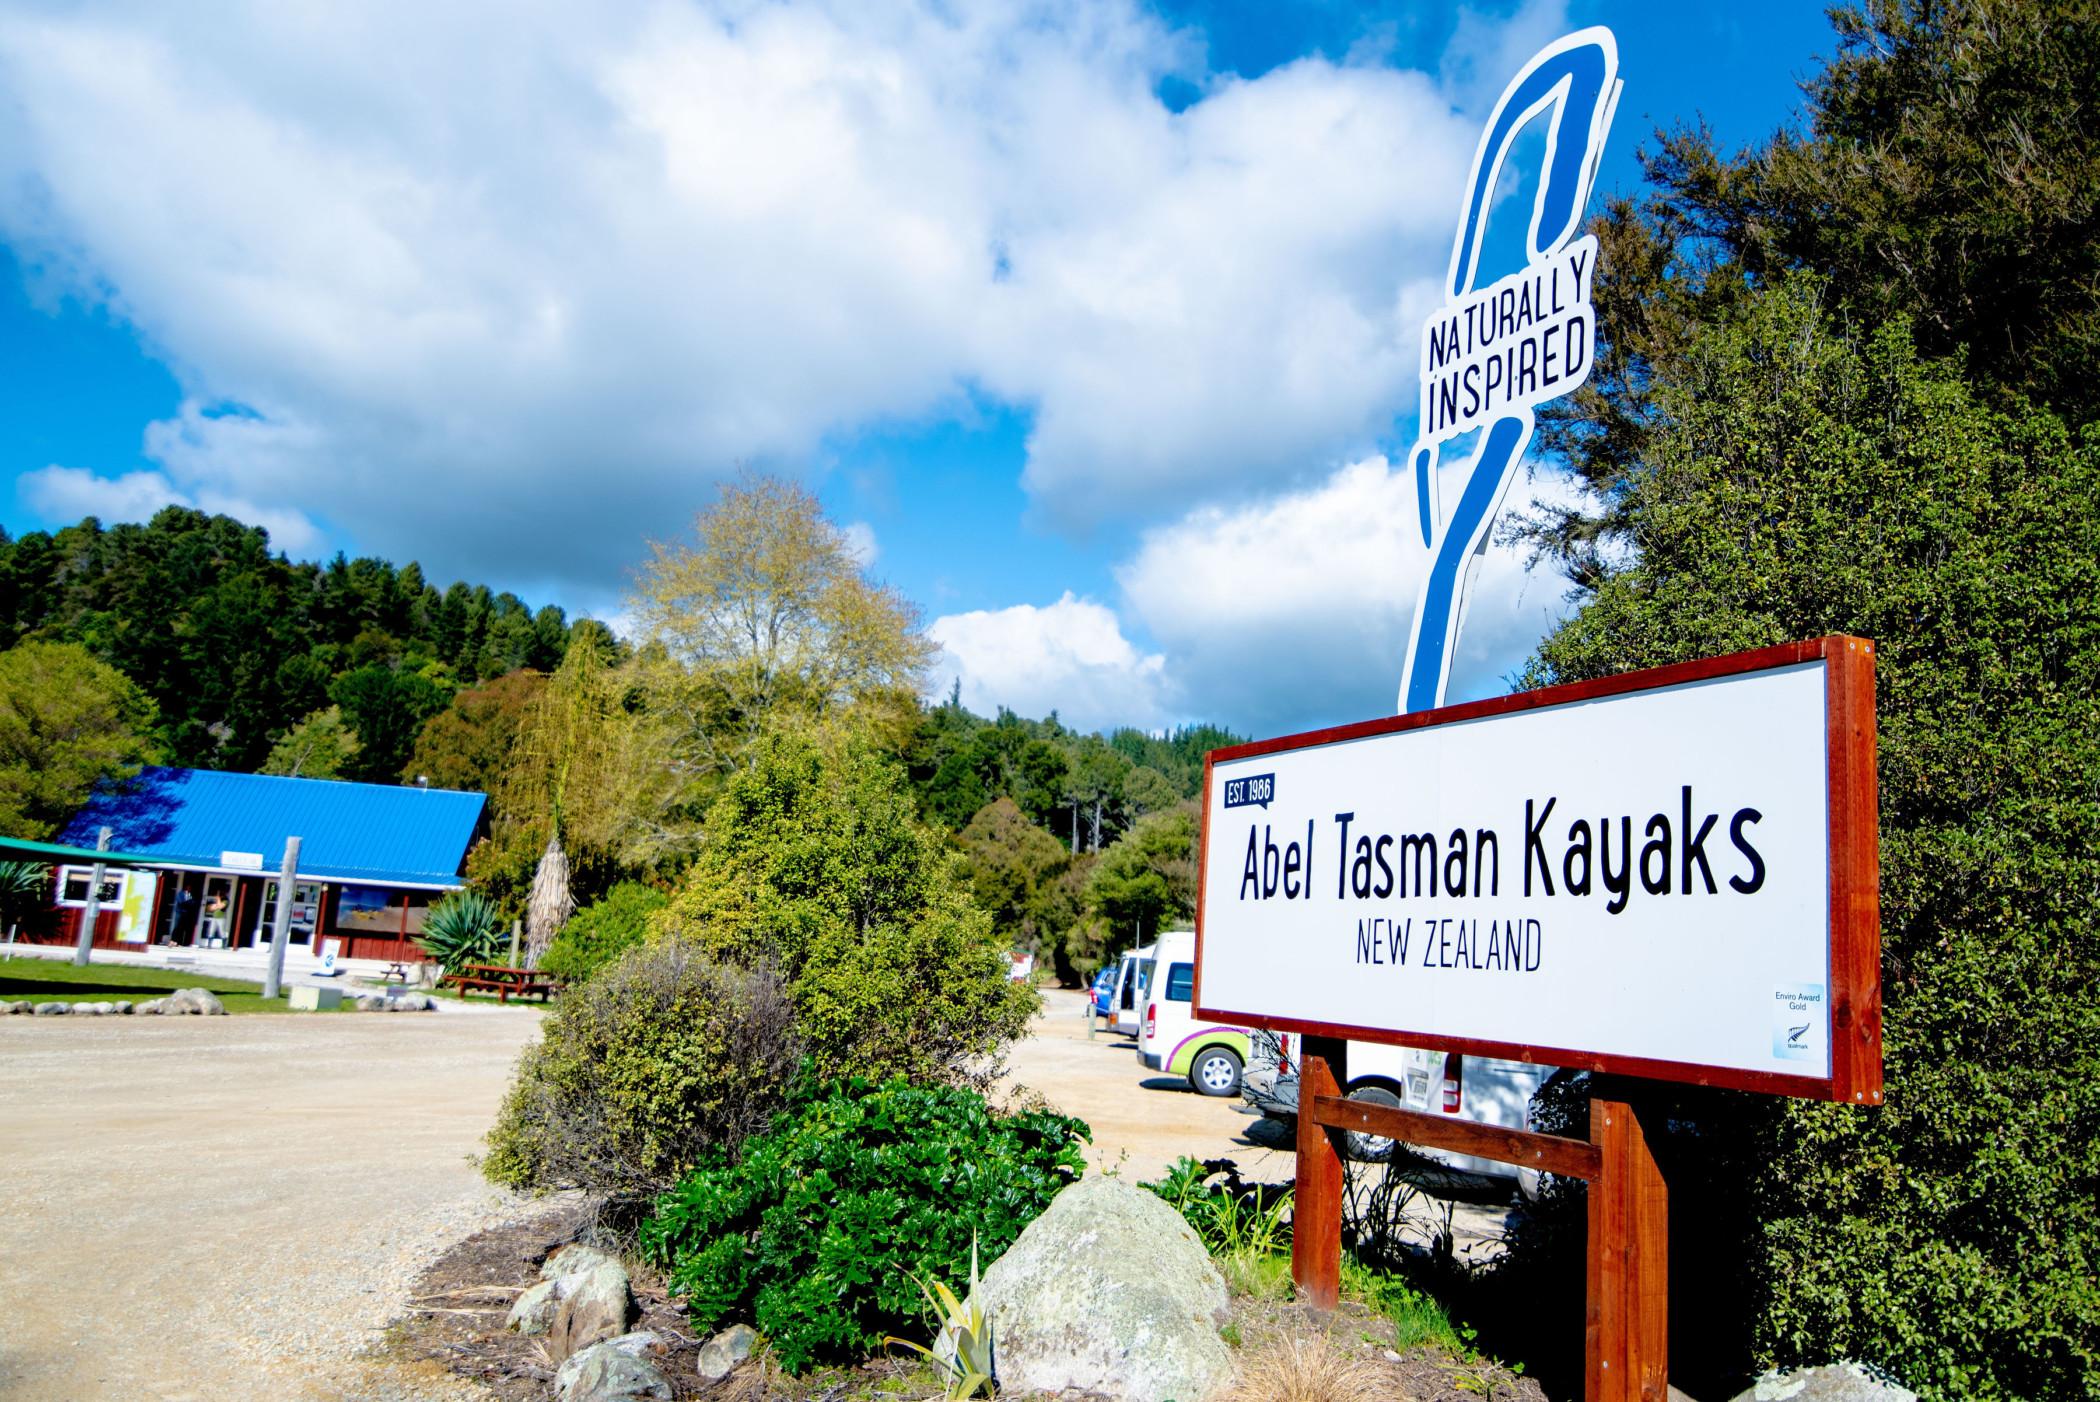 How to get there - Abel Tasman Kayaks